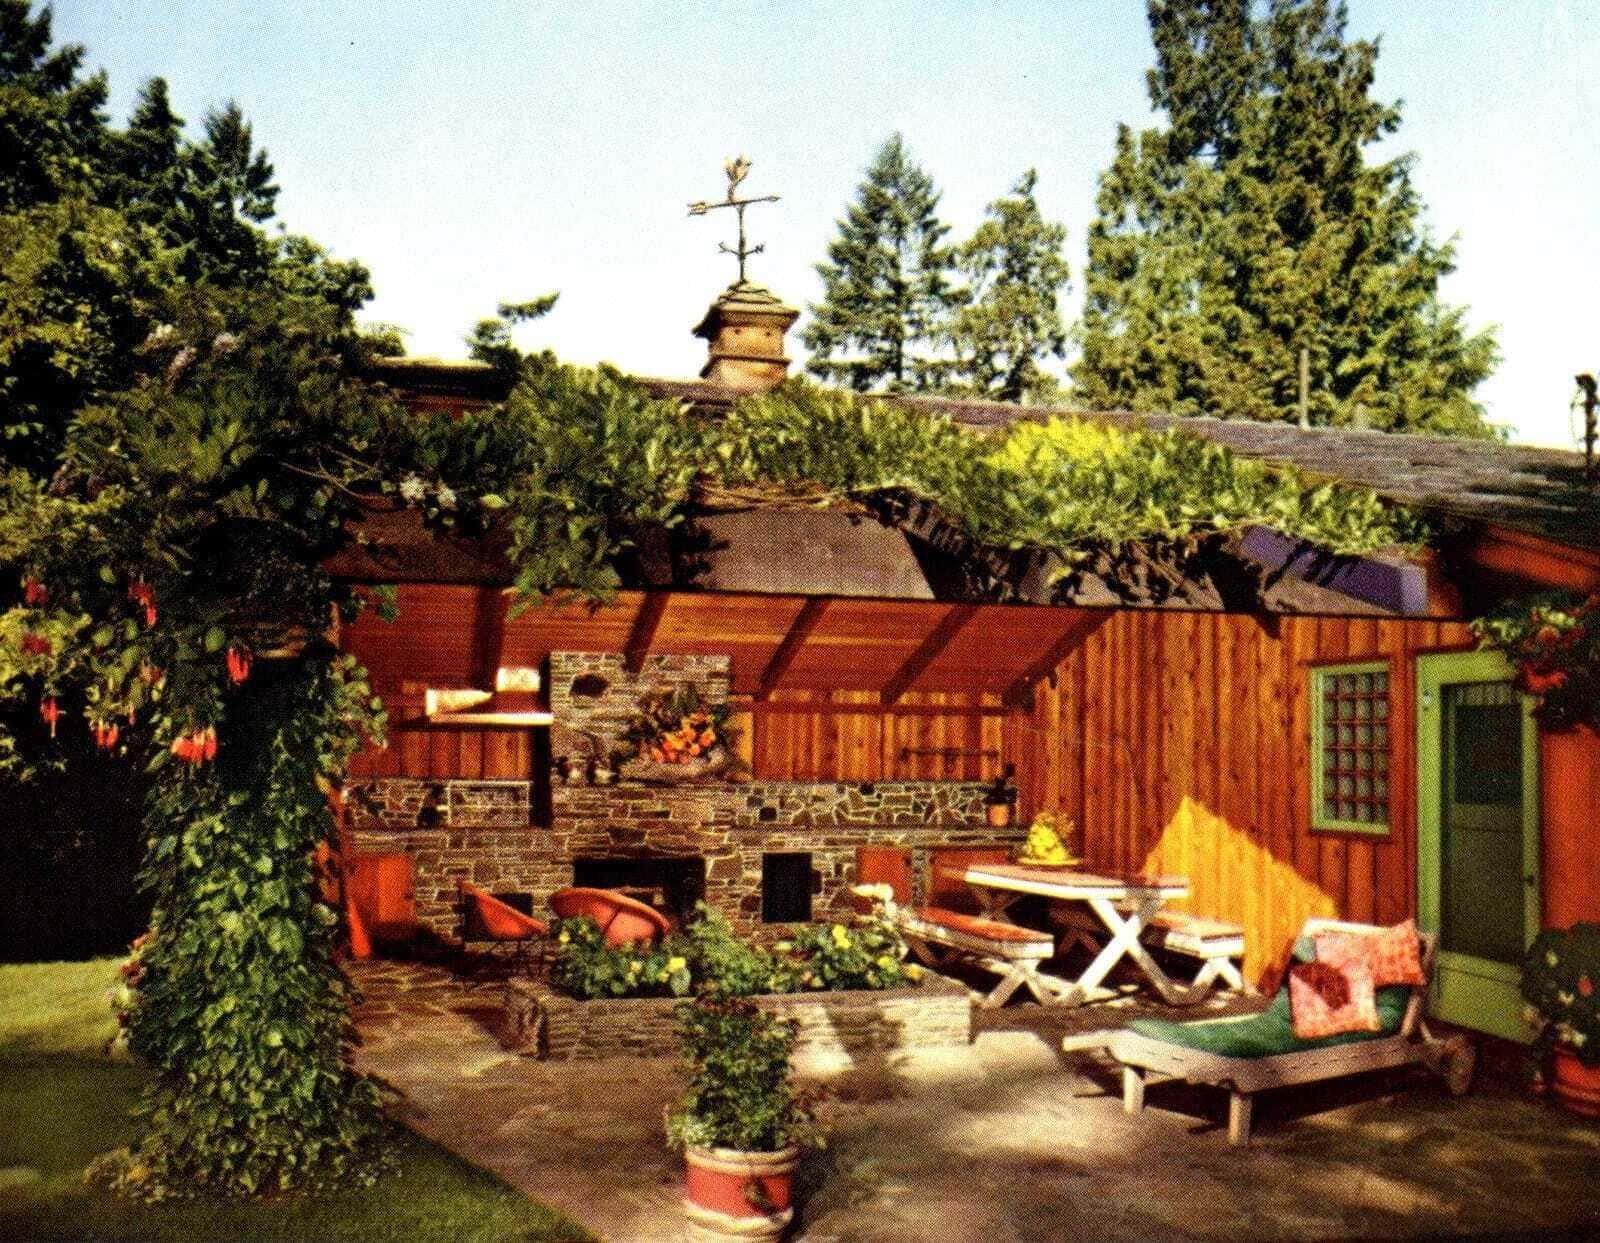 Open room garden outside - Vintage backyard inspiration from 1962